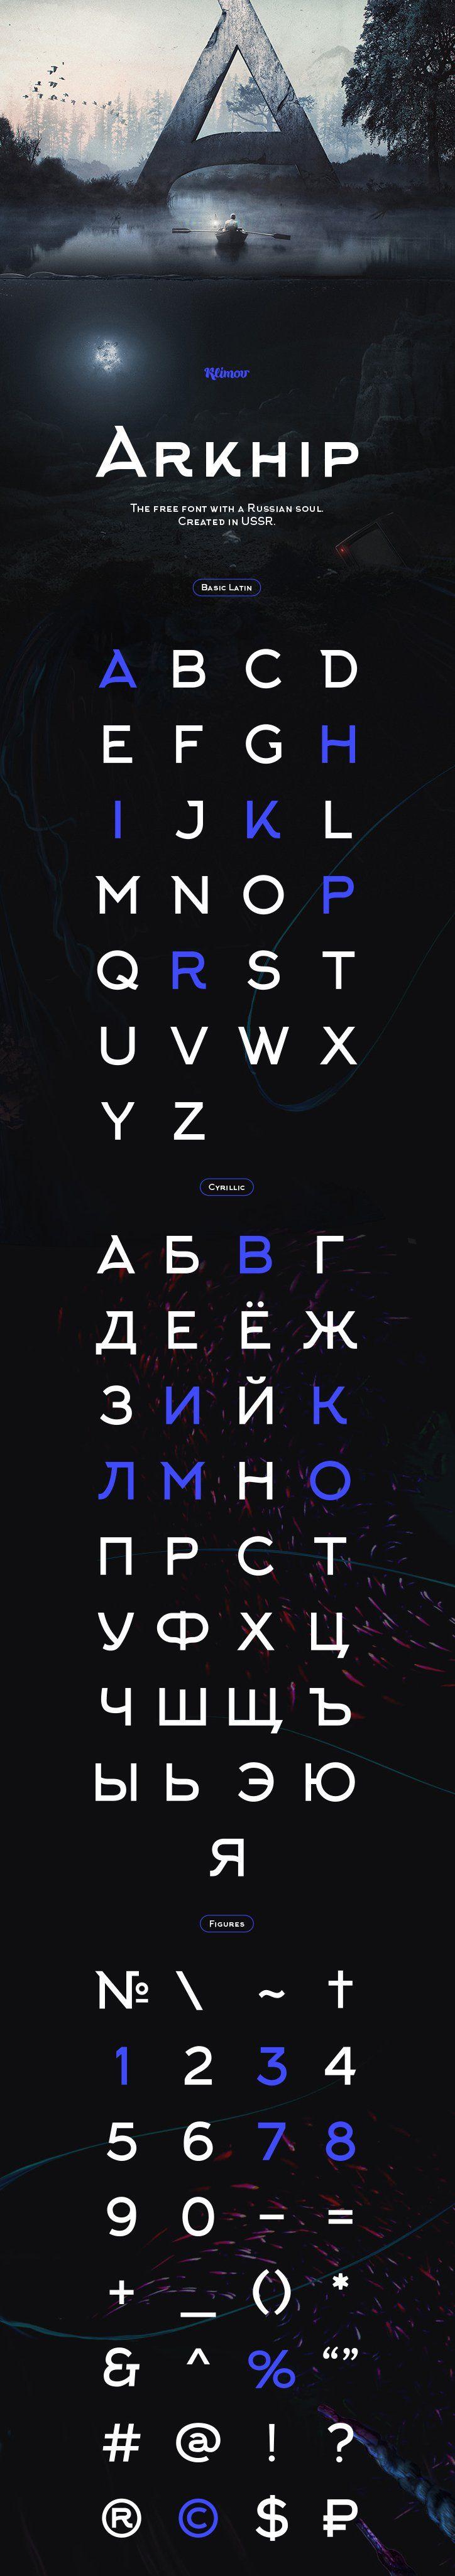 Arkhip Free Font